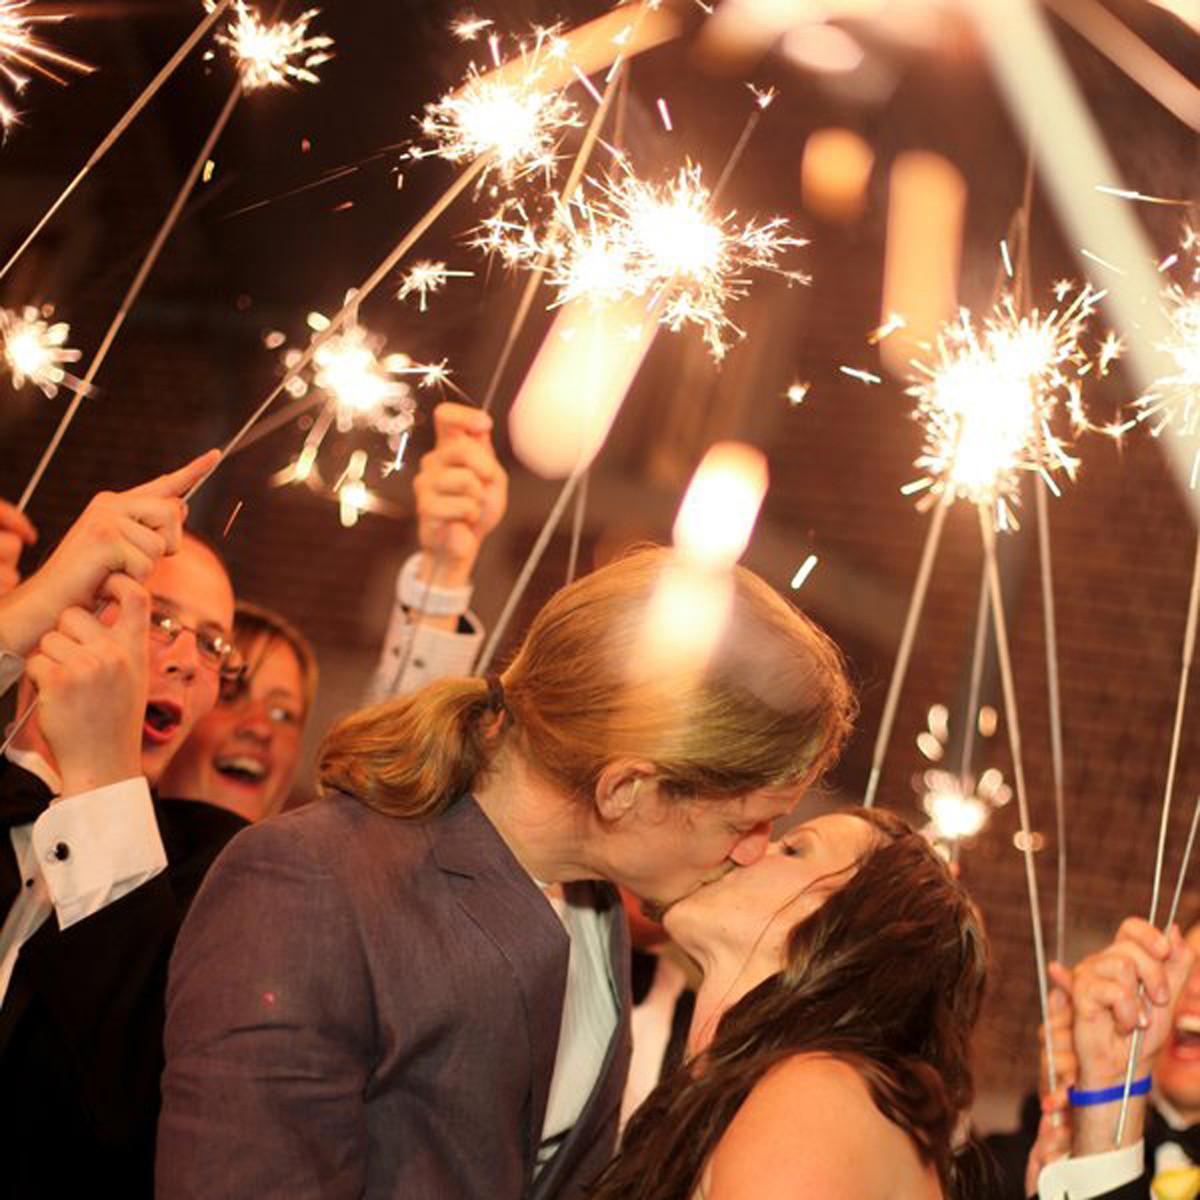 Wedding Sparkler  36 Showtime Wedding Sparklers 48 pk Wedding Sparklers USA